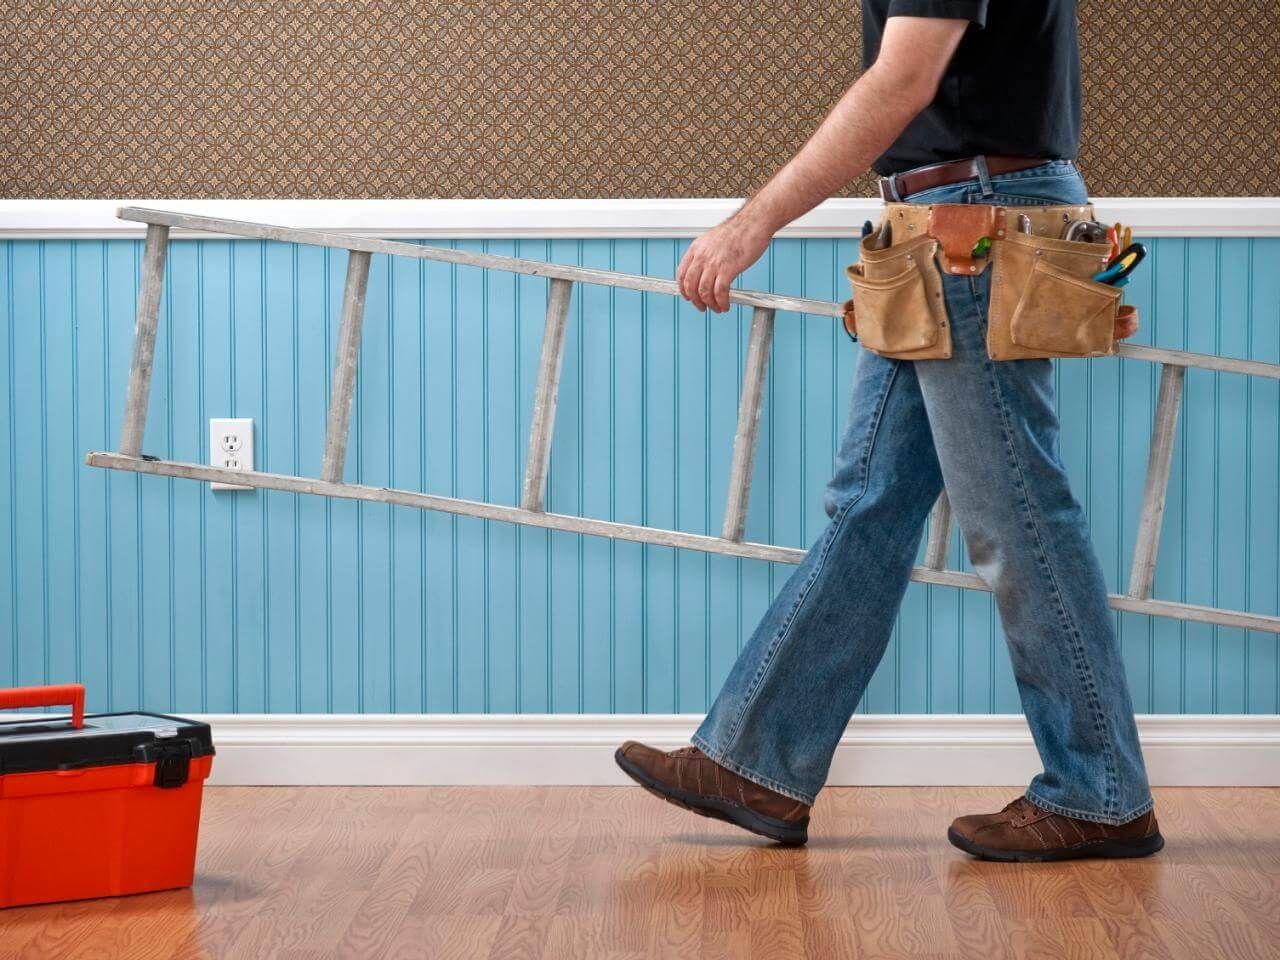 Should I Hire a Contractor or a Handyman? Home